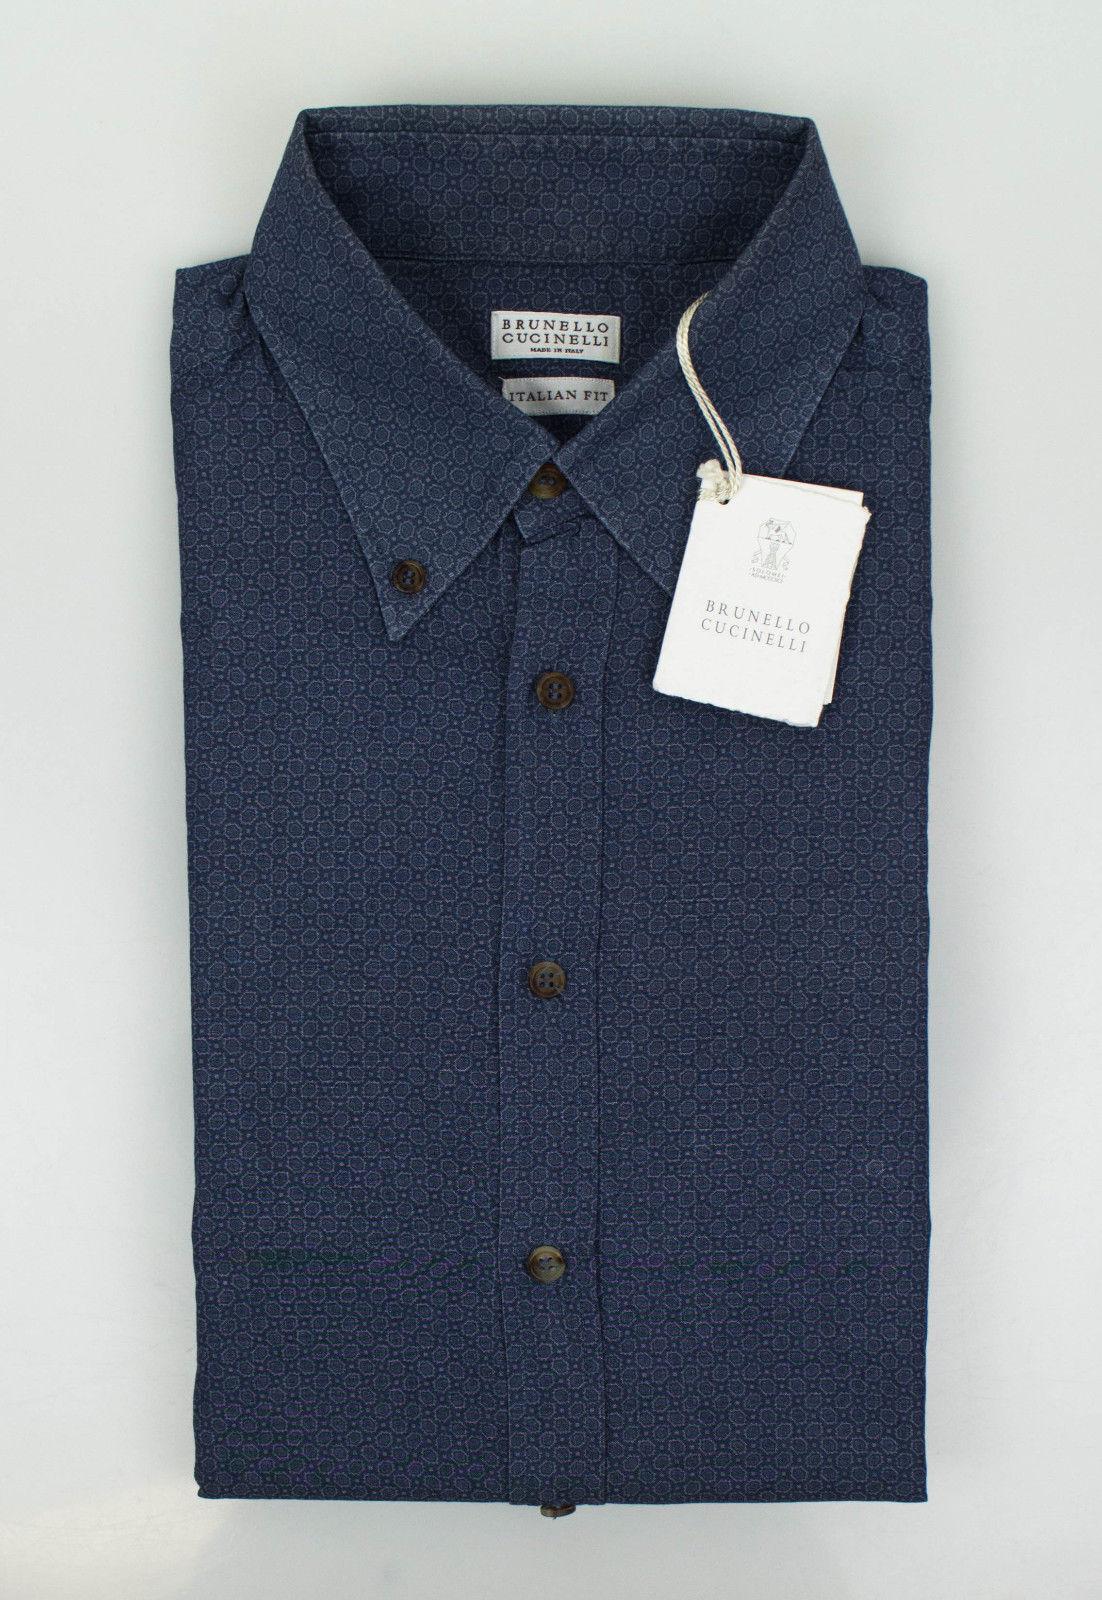 NWT BRUNELLO CUCINELLI bluee Cotton Italian Fit Casual Shirt Size 50 40 M